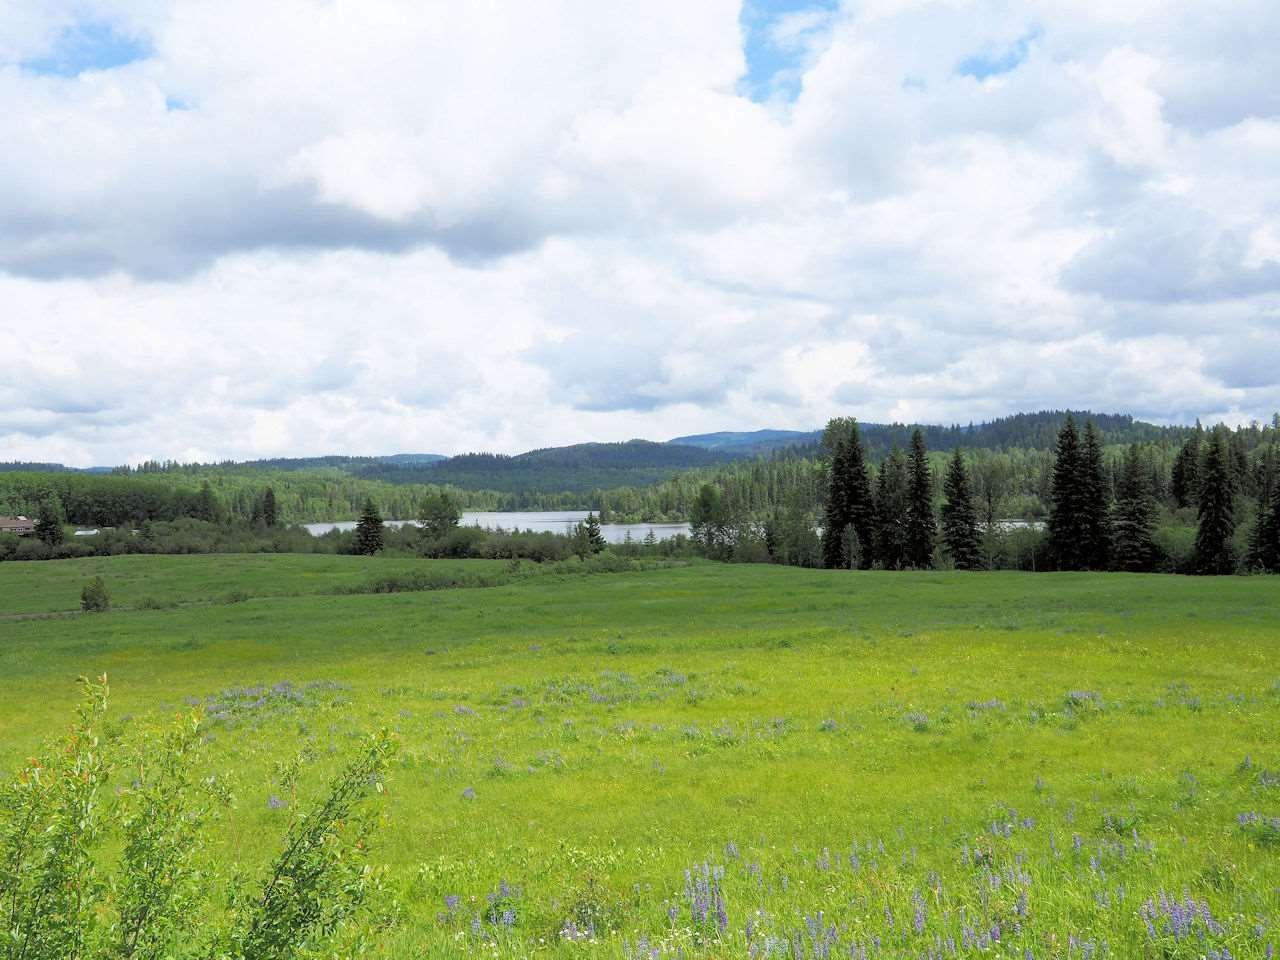 Main Photo: LOT 1 WILSON LAKE Road in Bridge Lake: Bridge Lake/Sheridan Lake Land for sale (100 Mile House (Zone 10))  : MLS®# R2462170